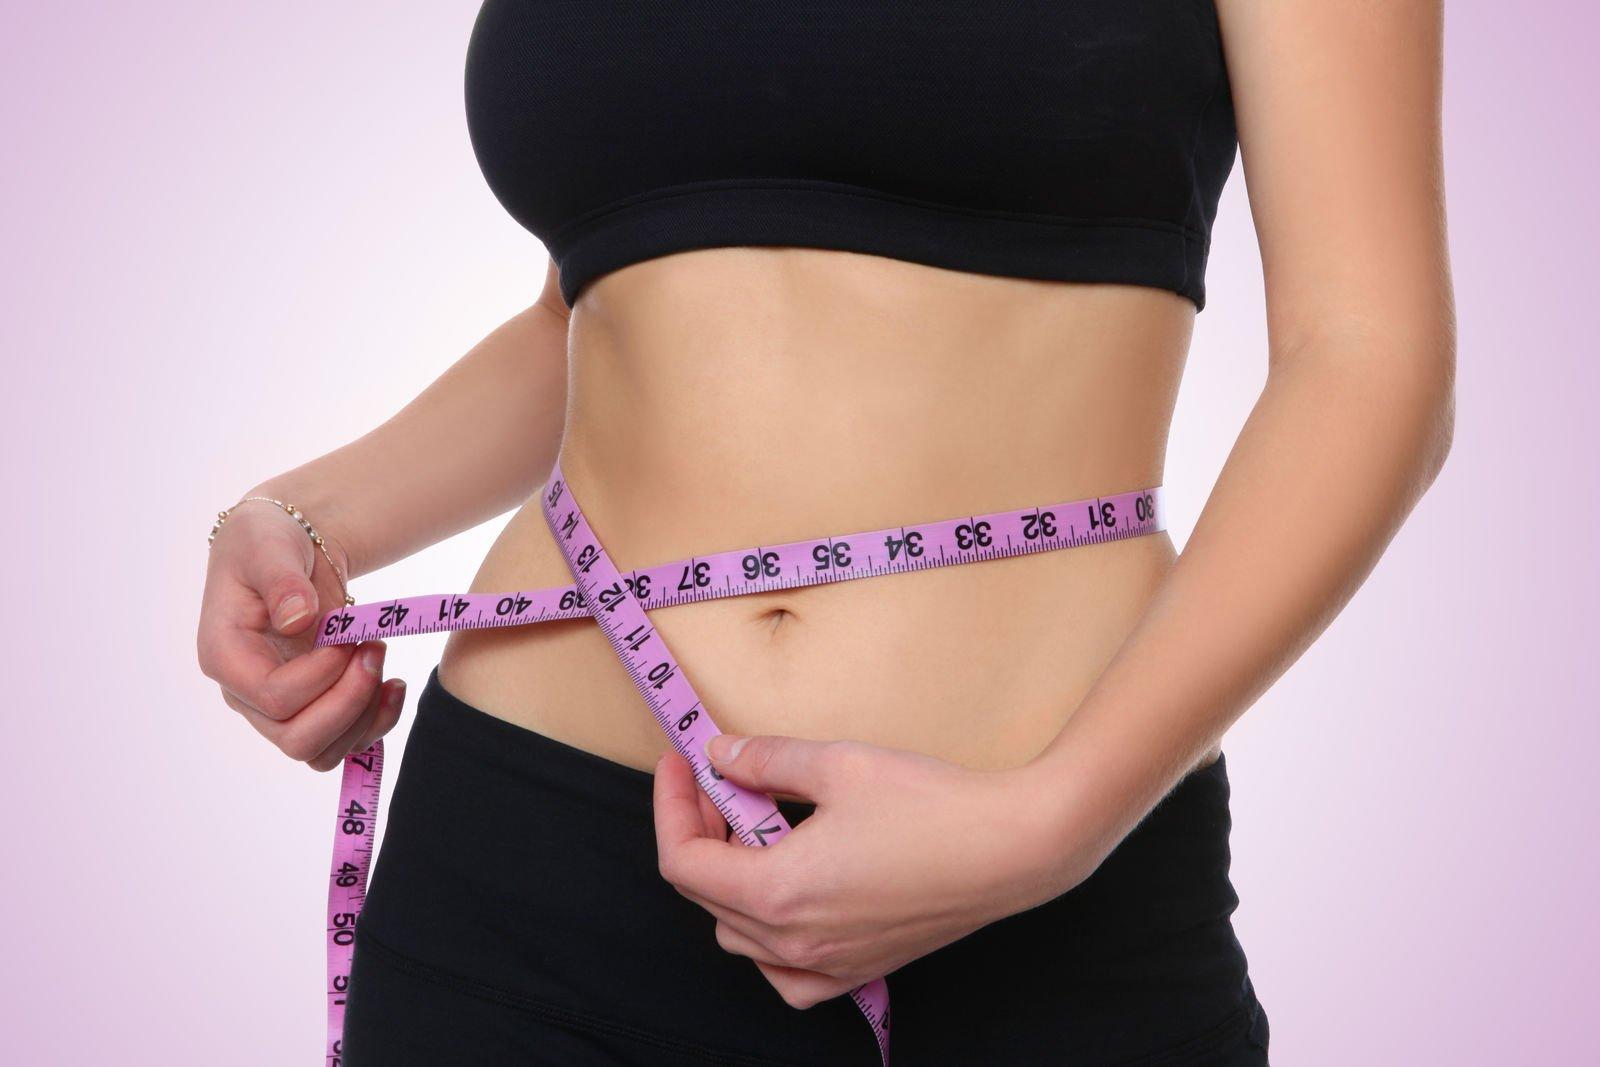 will creatine make me gain weight? | exercise blog